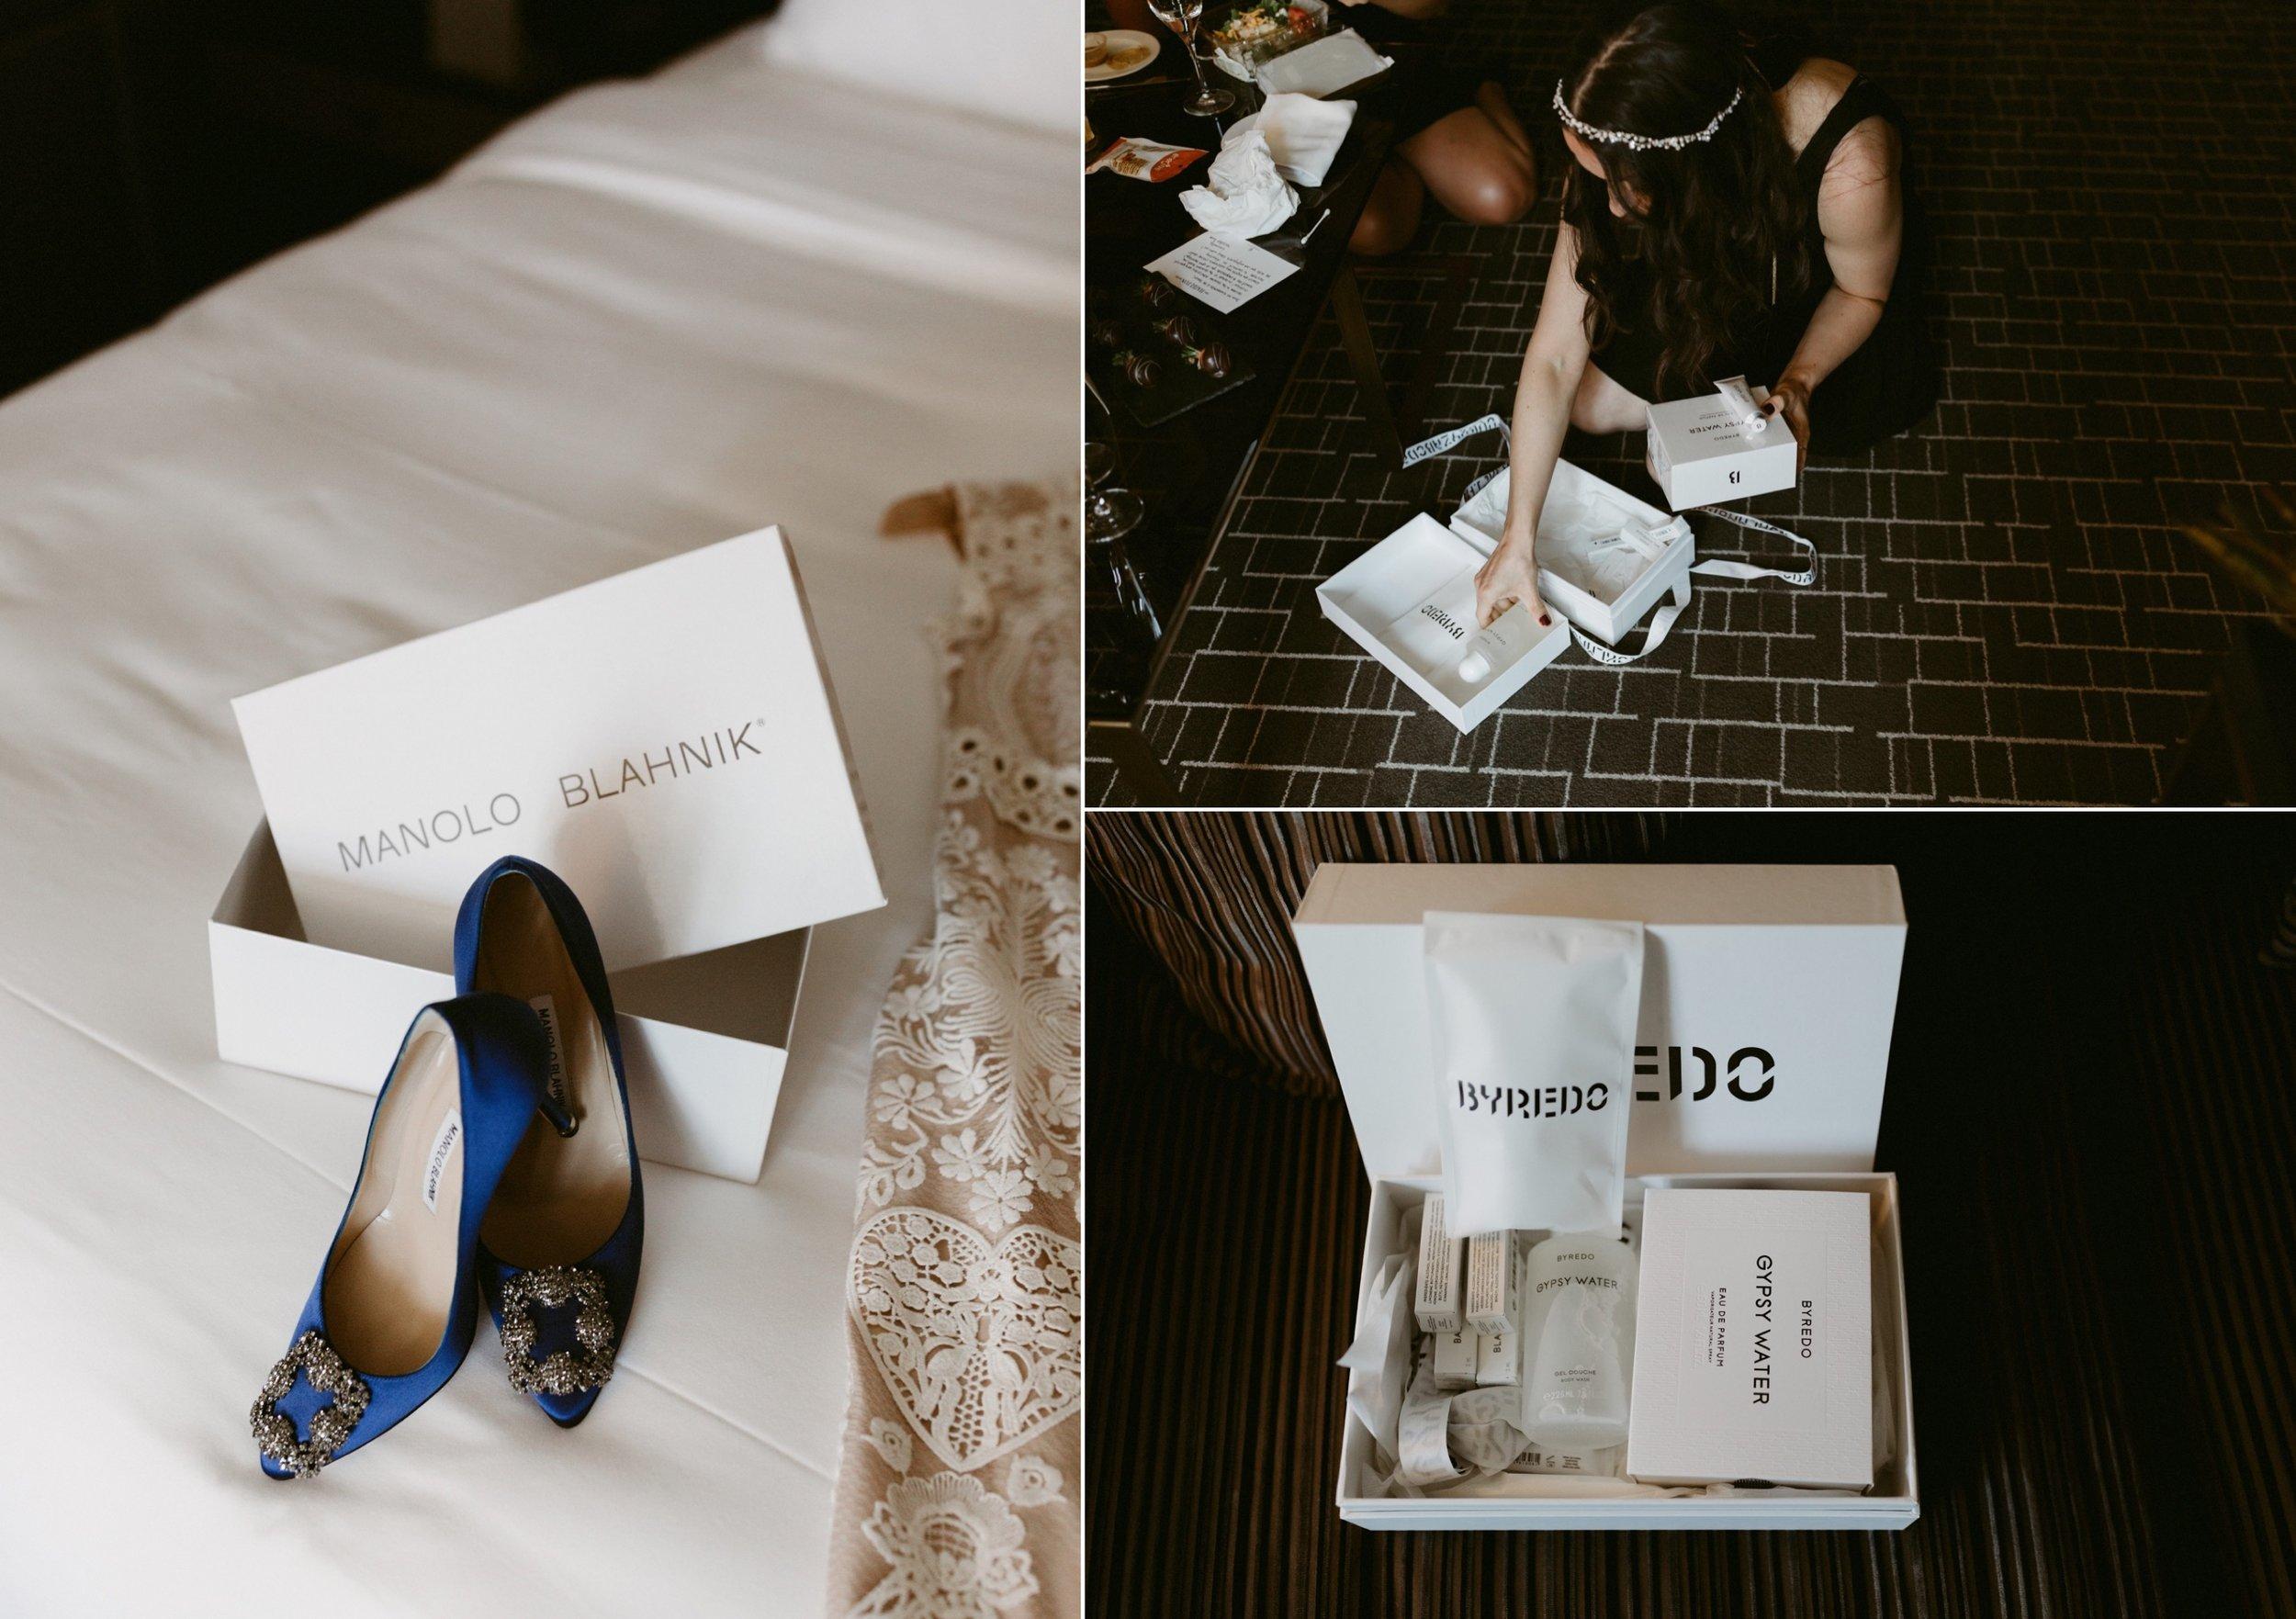 001_Spadina House Wedding (9.5 of 748)_Spadina House Wedding (4 of 748)_Spadina House Wedding (8 of 748)_House_Spadina_Wedding_Toronto_intimate.jpg